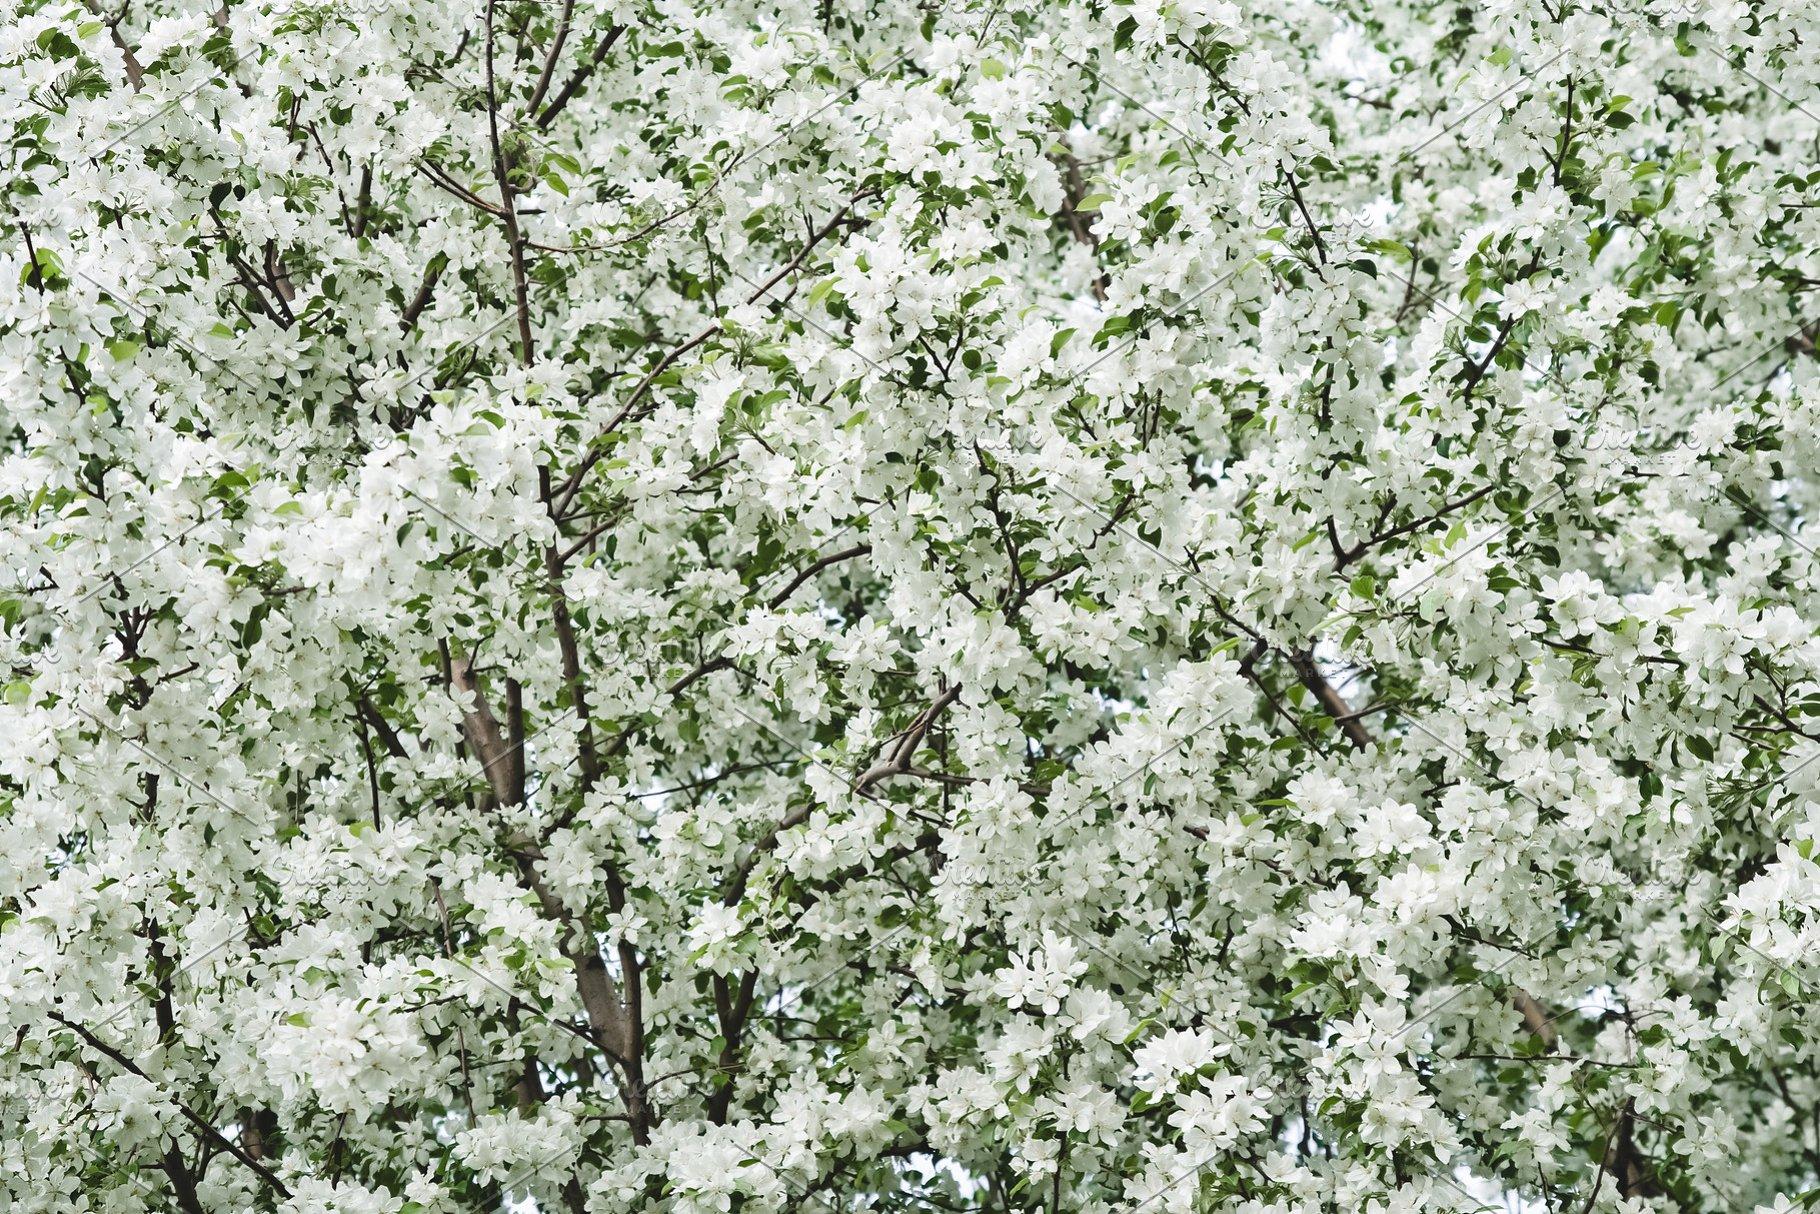 White Blossom Of Spring Trees High Quality Nature Stock Photos